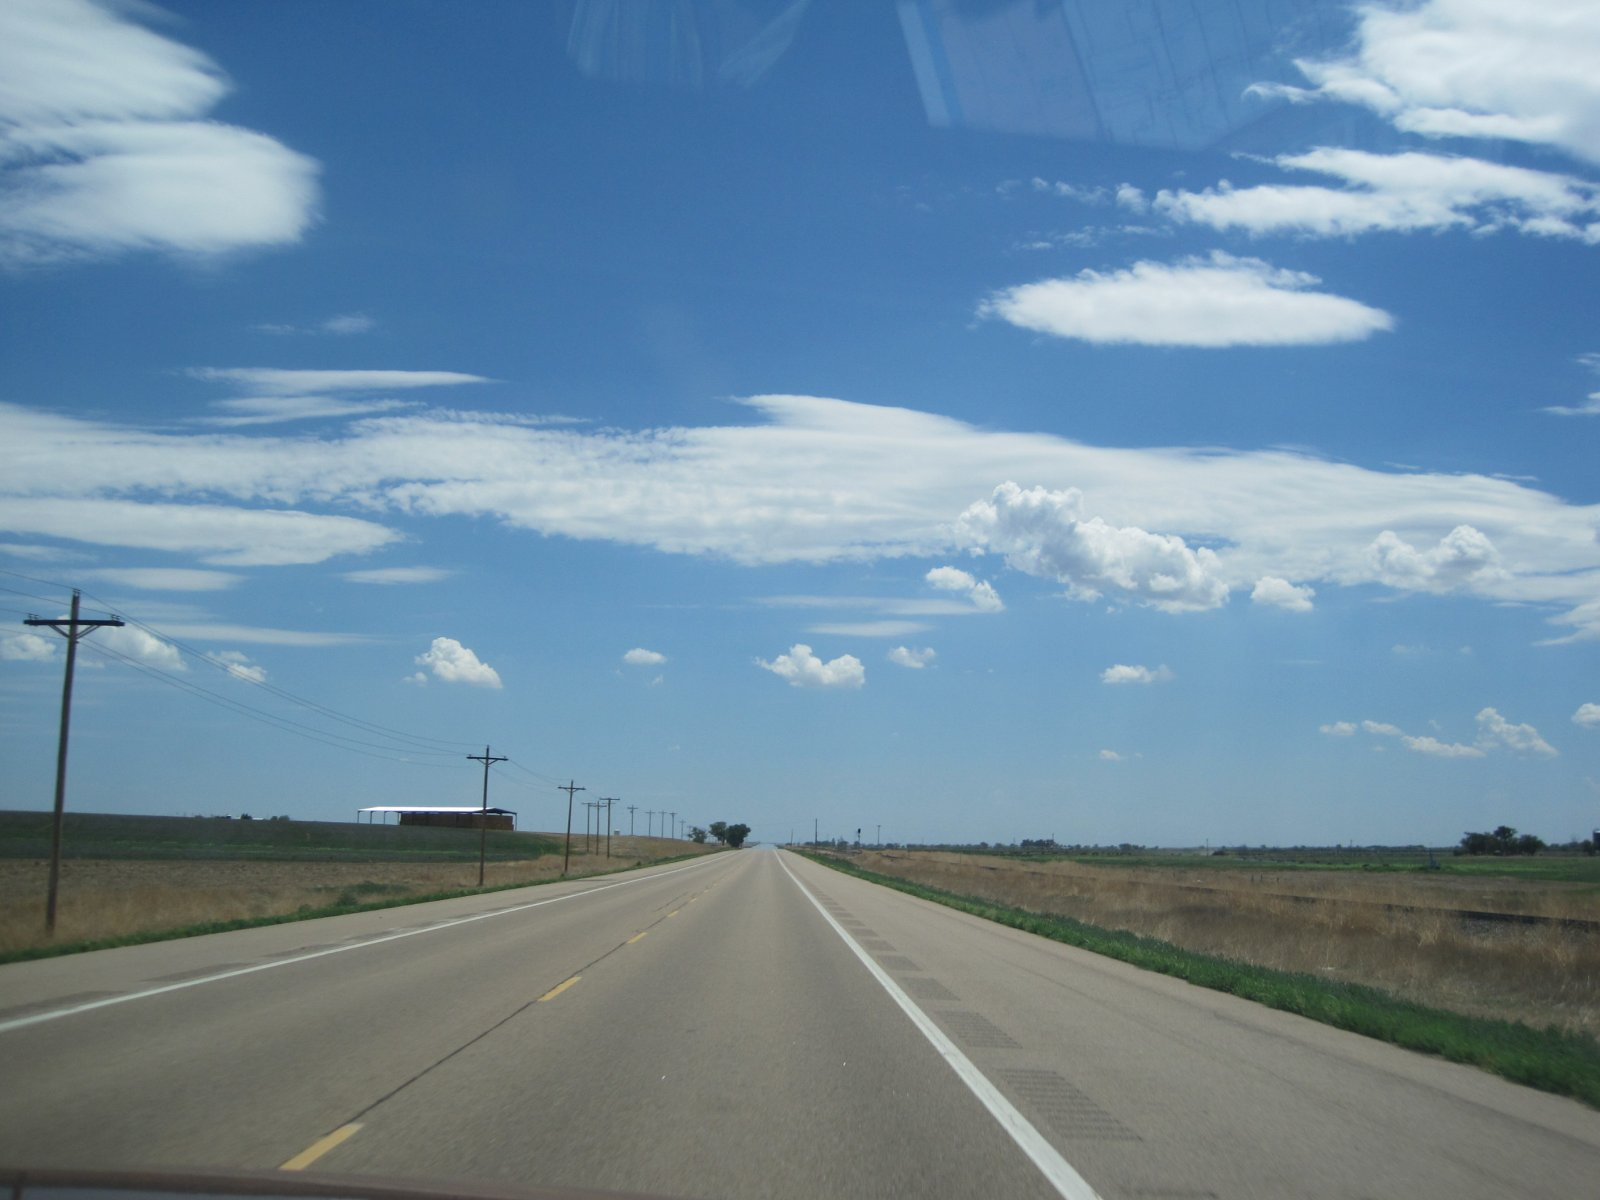 Click image for larger version  Name:July 15, 2011 W Colorado, Dodge City, KS 031.jpg Views:81 Size:167.3 KB ID:135089